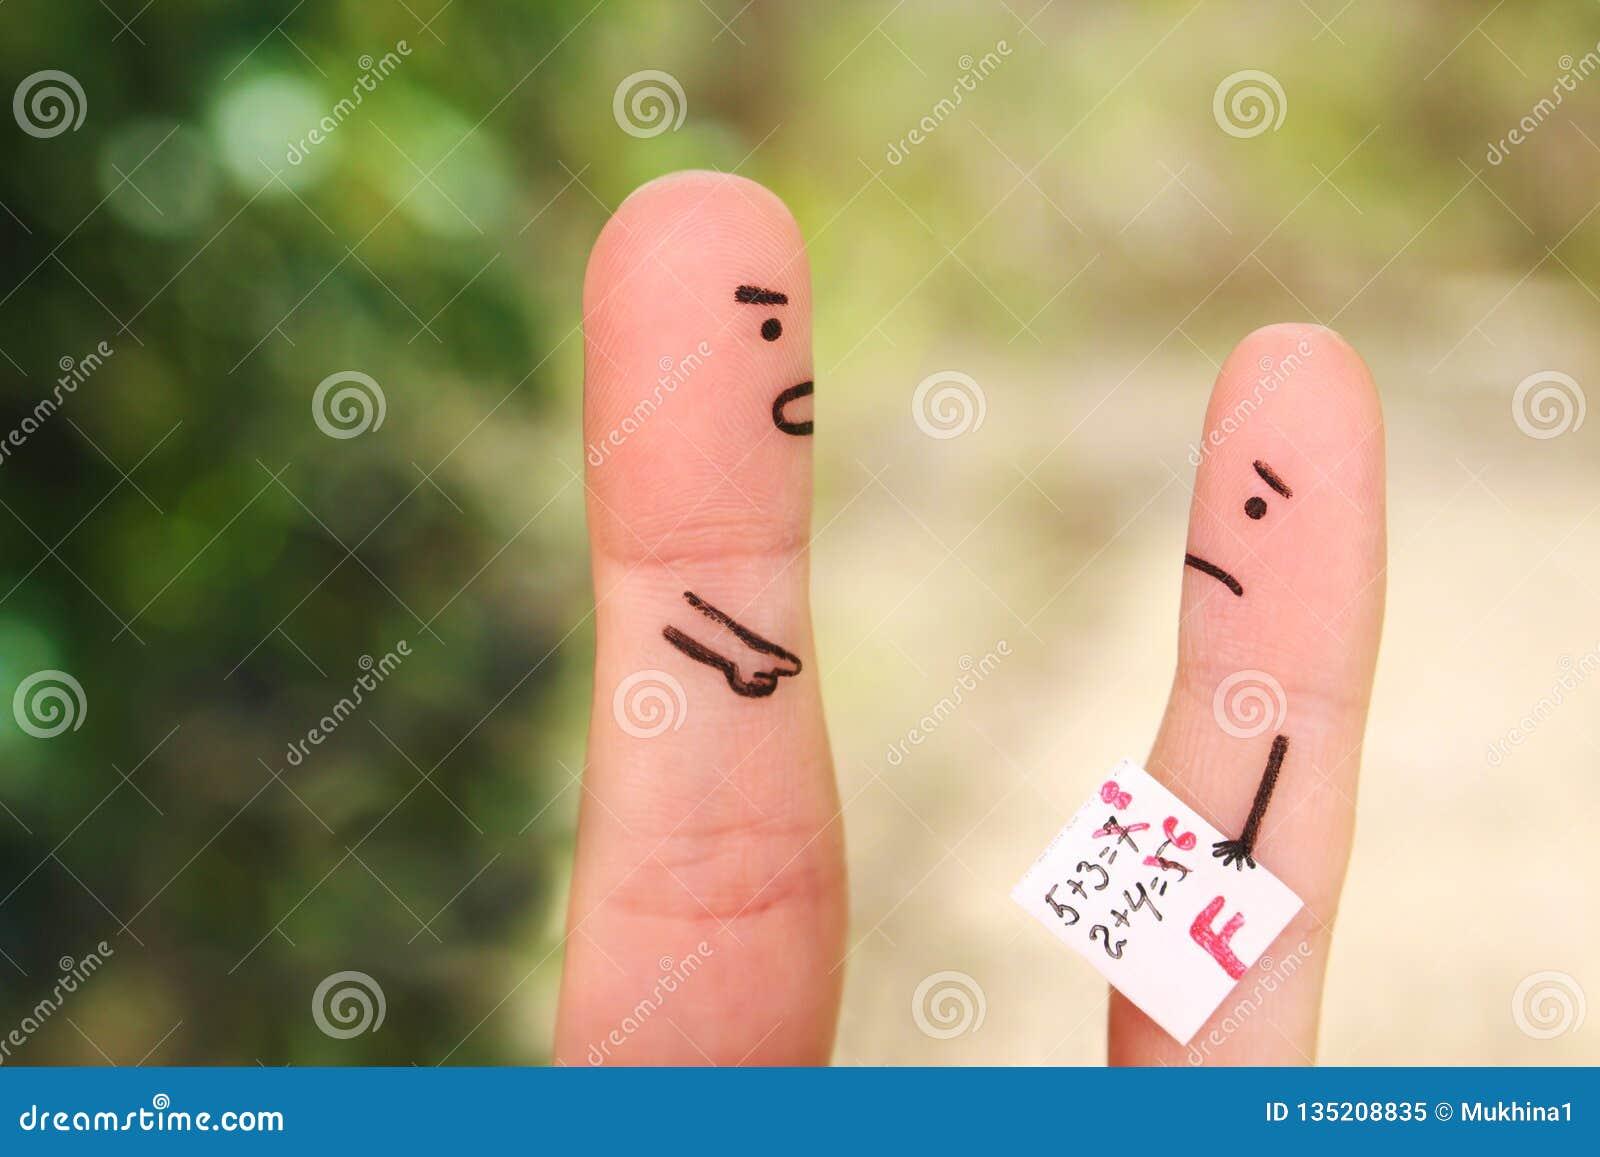 Fingers art of people. Concept of boy got bad grade, man scolding child